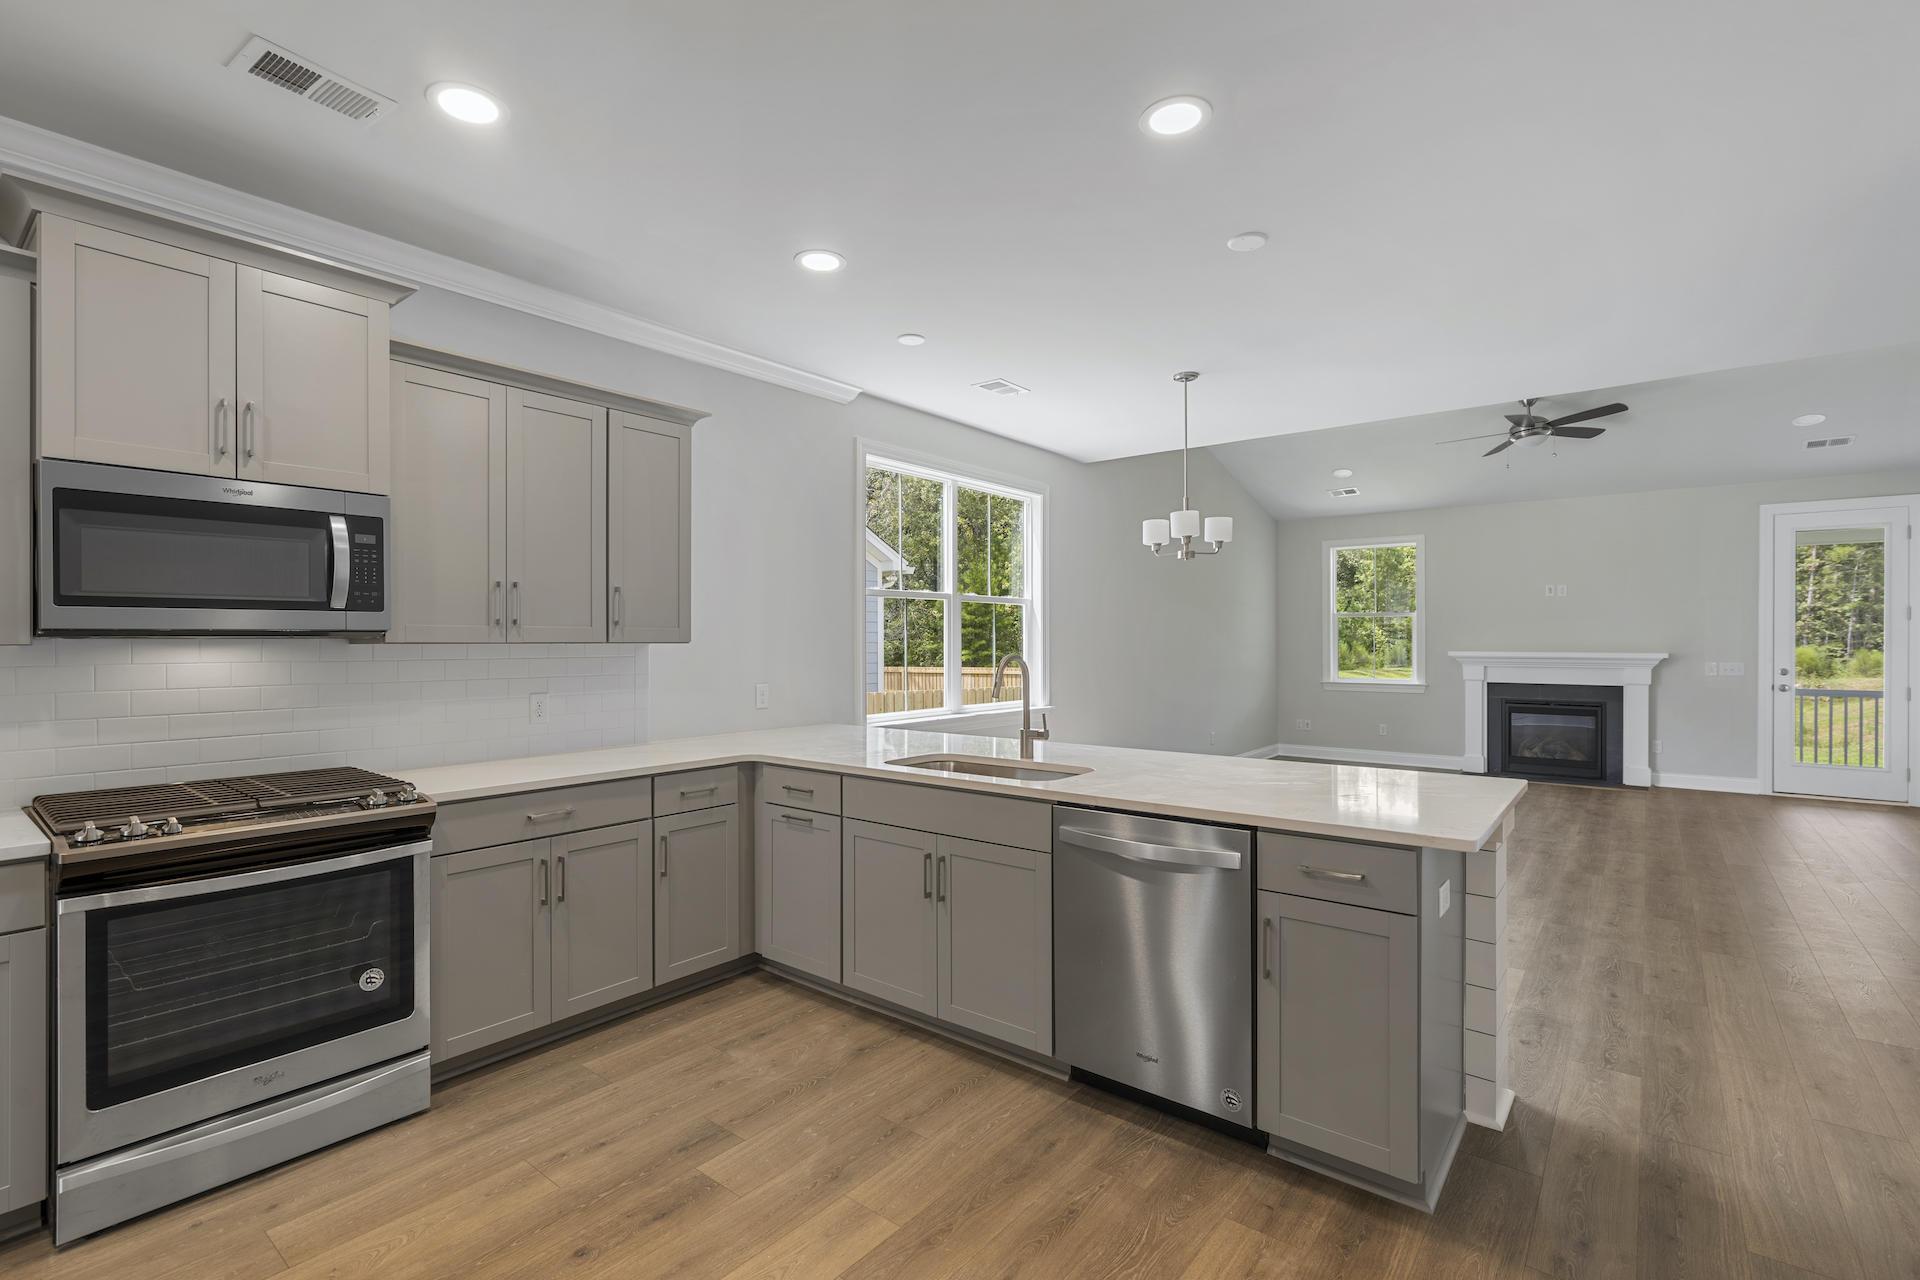 Drayton Oaks Homes For Sale - 105 Plowden Mill, Summerville, SC - 21